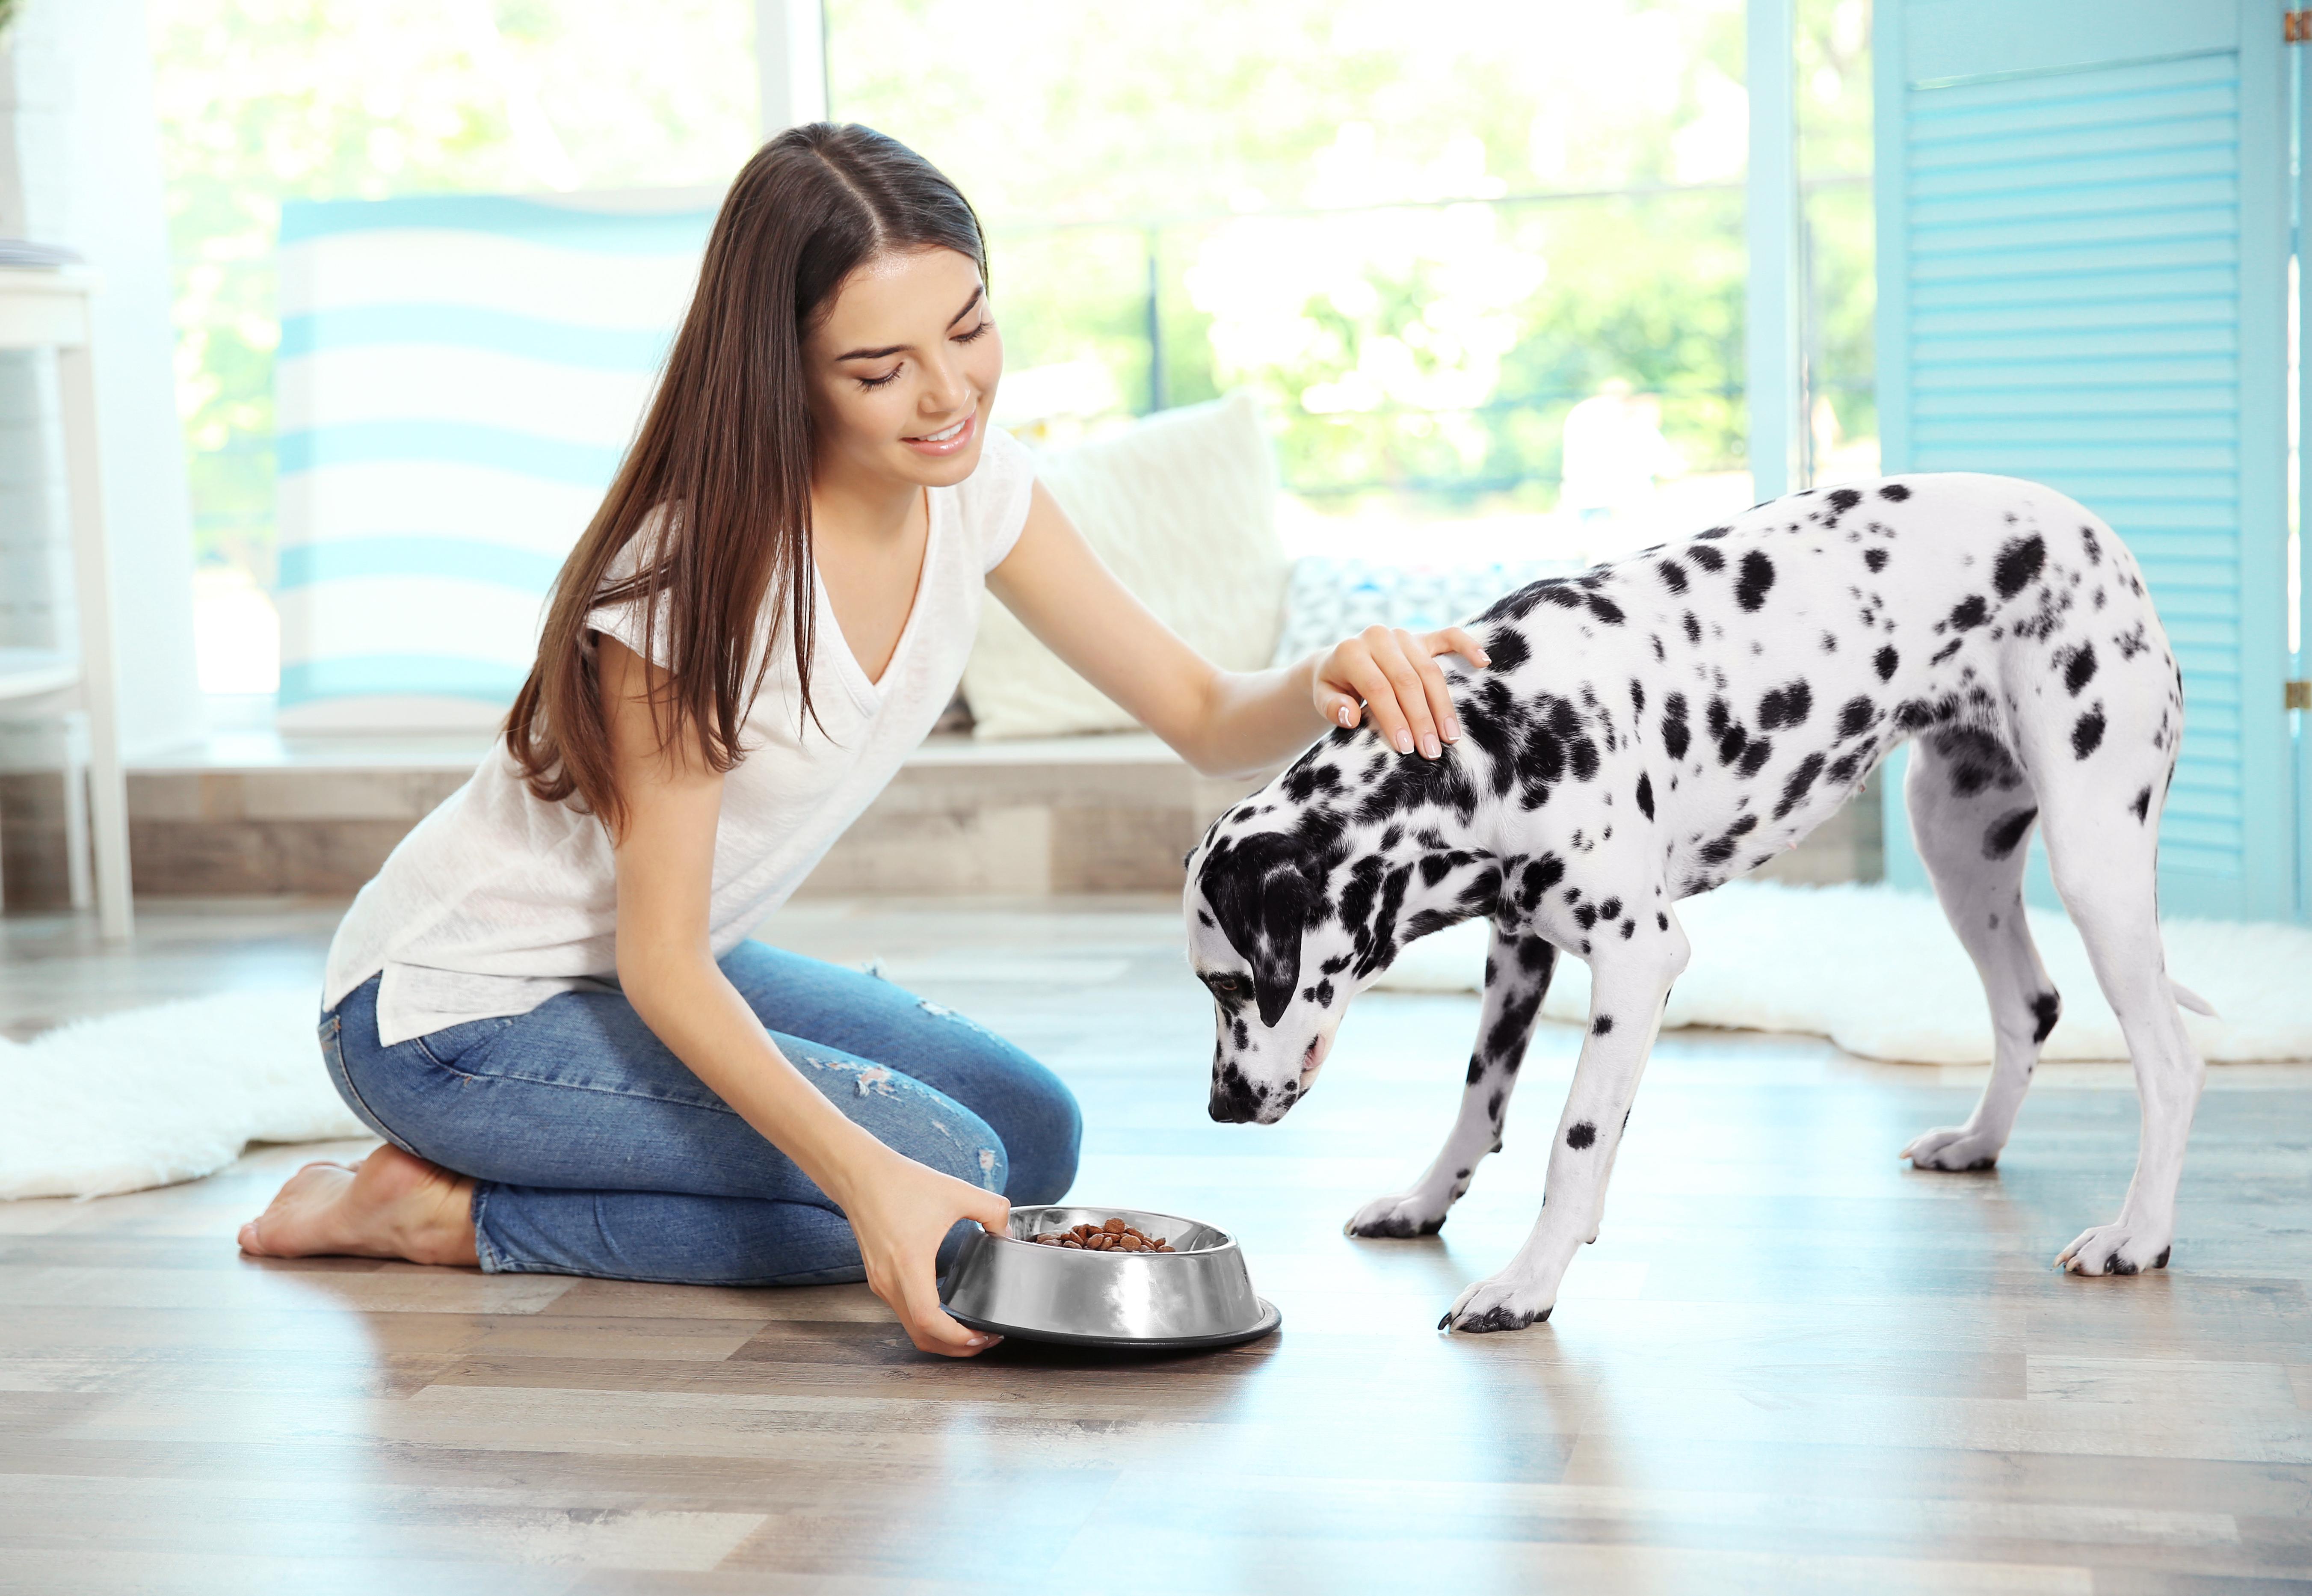 girlfeedingdog